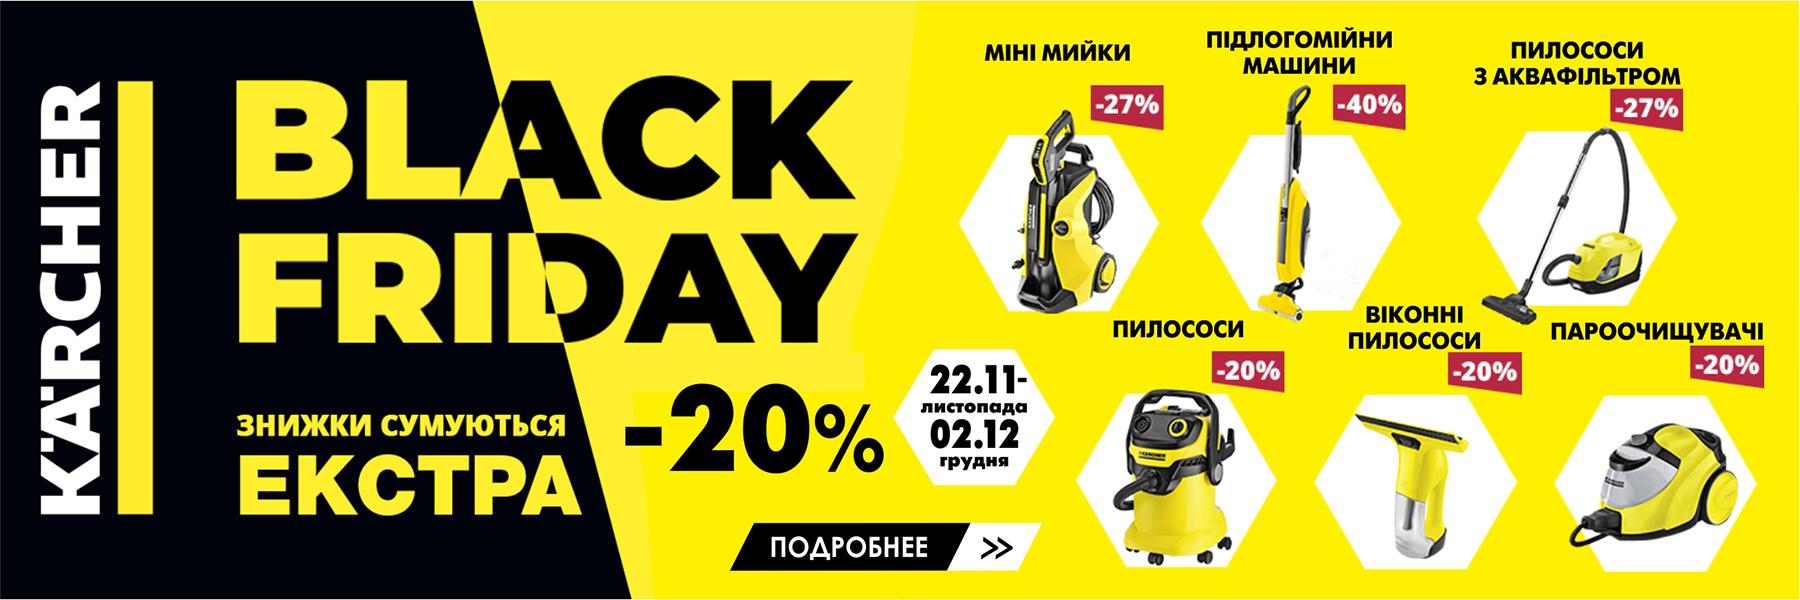 Karcher: Black Friday все ближче — ціни нижче! 22.11-02.12